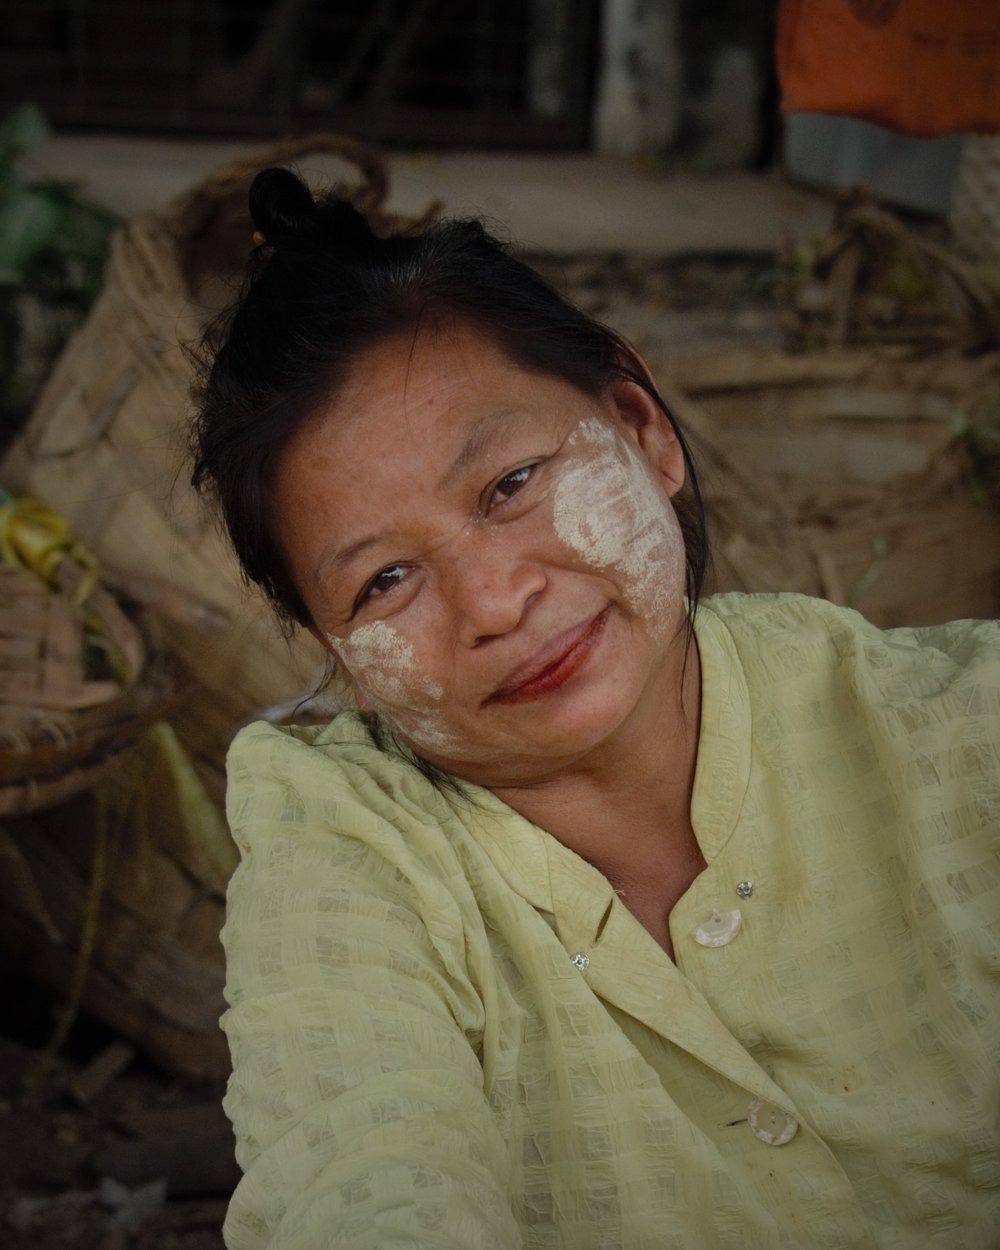 Market lady, Mandalay, Myanmar